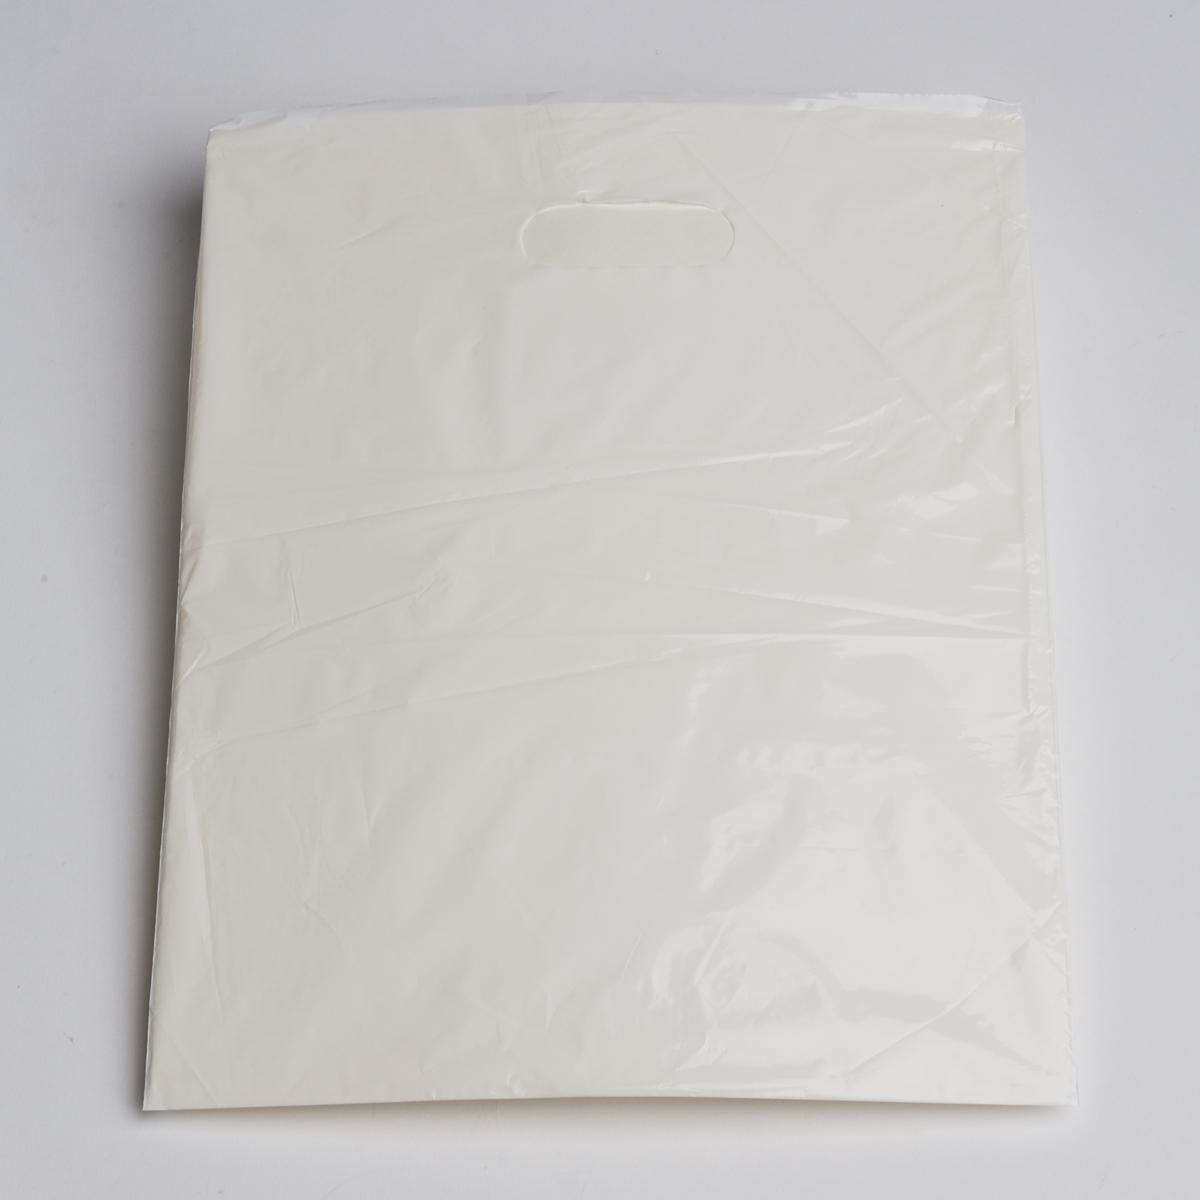 Medium White Low Density Plastic Bag